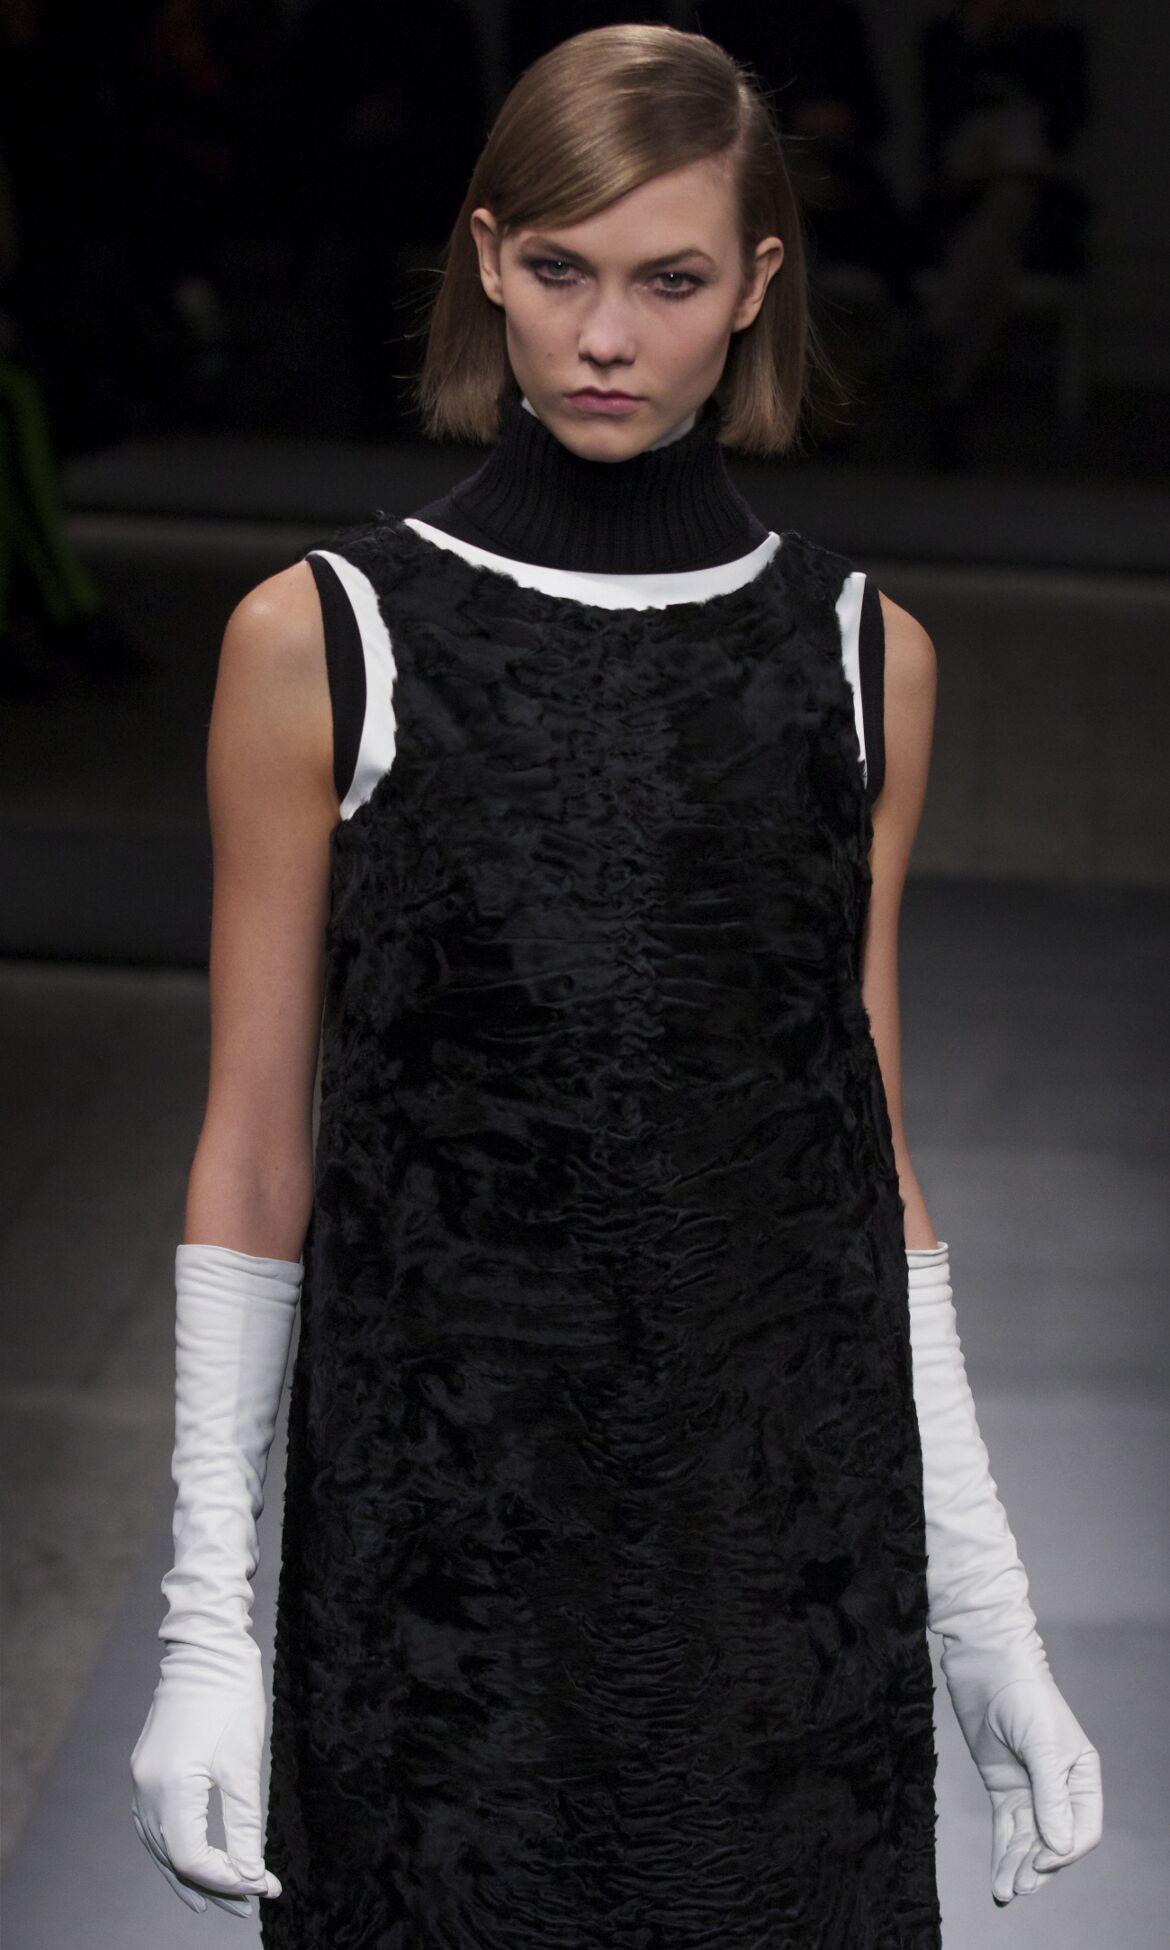 2013 Winter Model Trends Woman Ports 1961